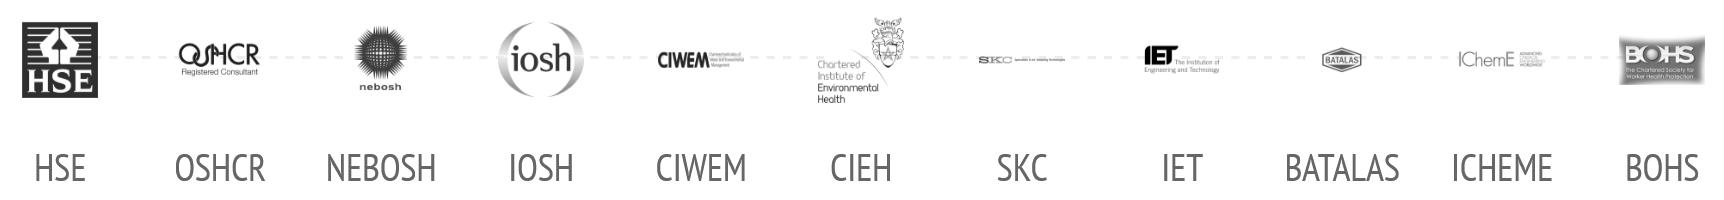 Certification Logos: HSE, OSHCR, NEBOSH, IOSH, CIWEM, CIEH, SKC, IET, BATALAS, ICHEME, BOHS